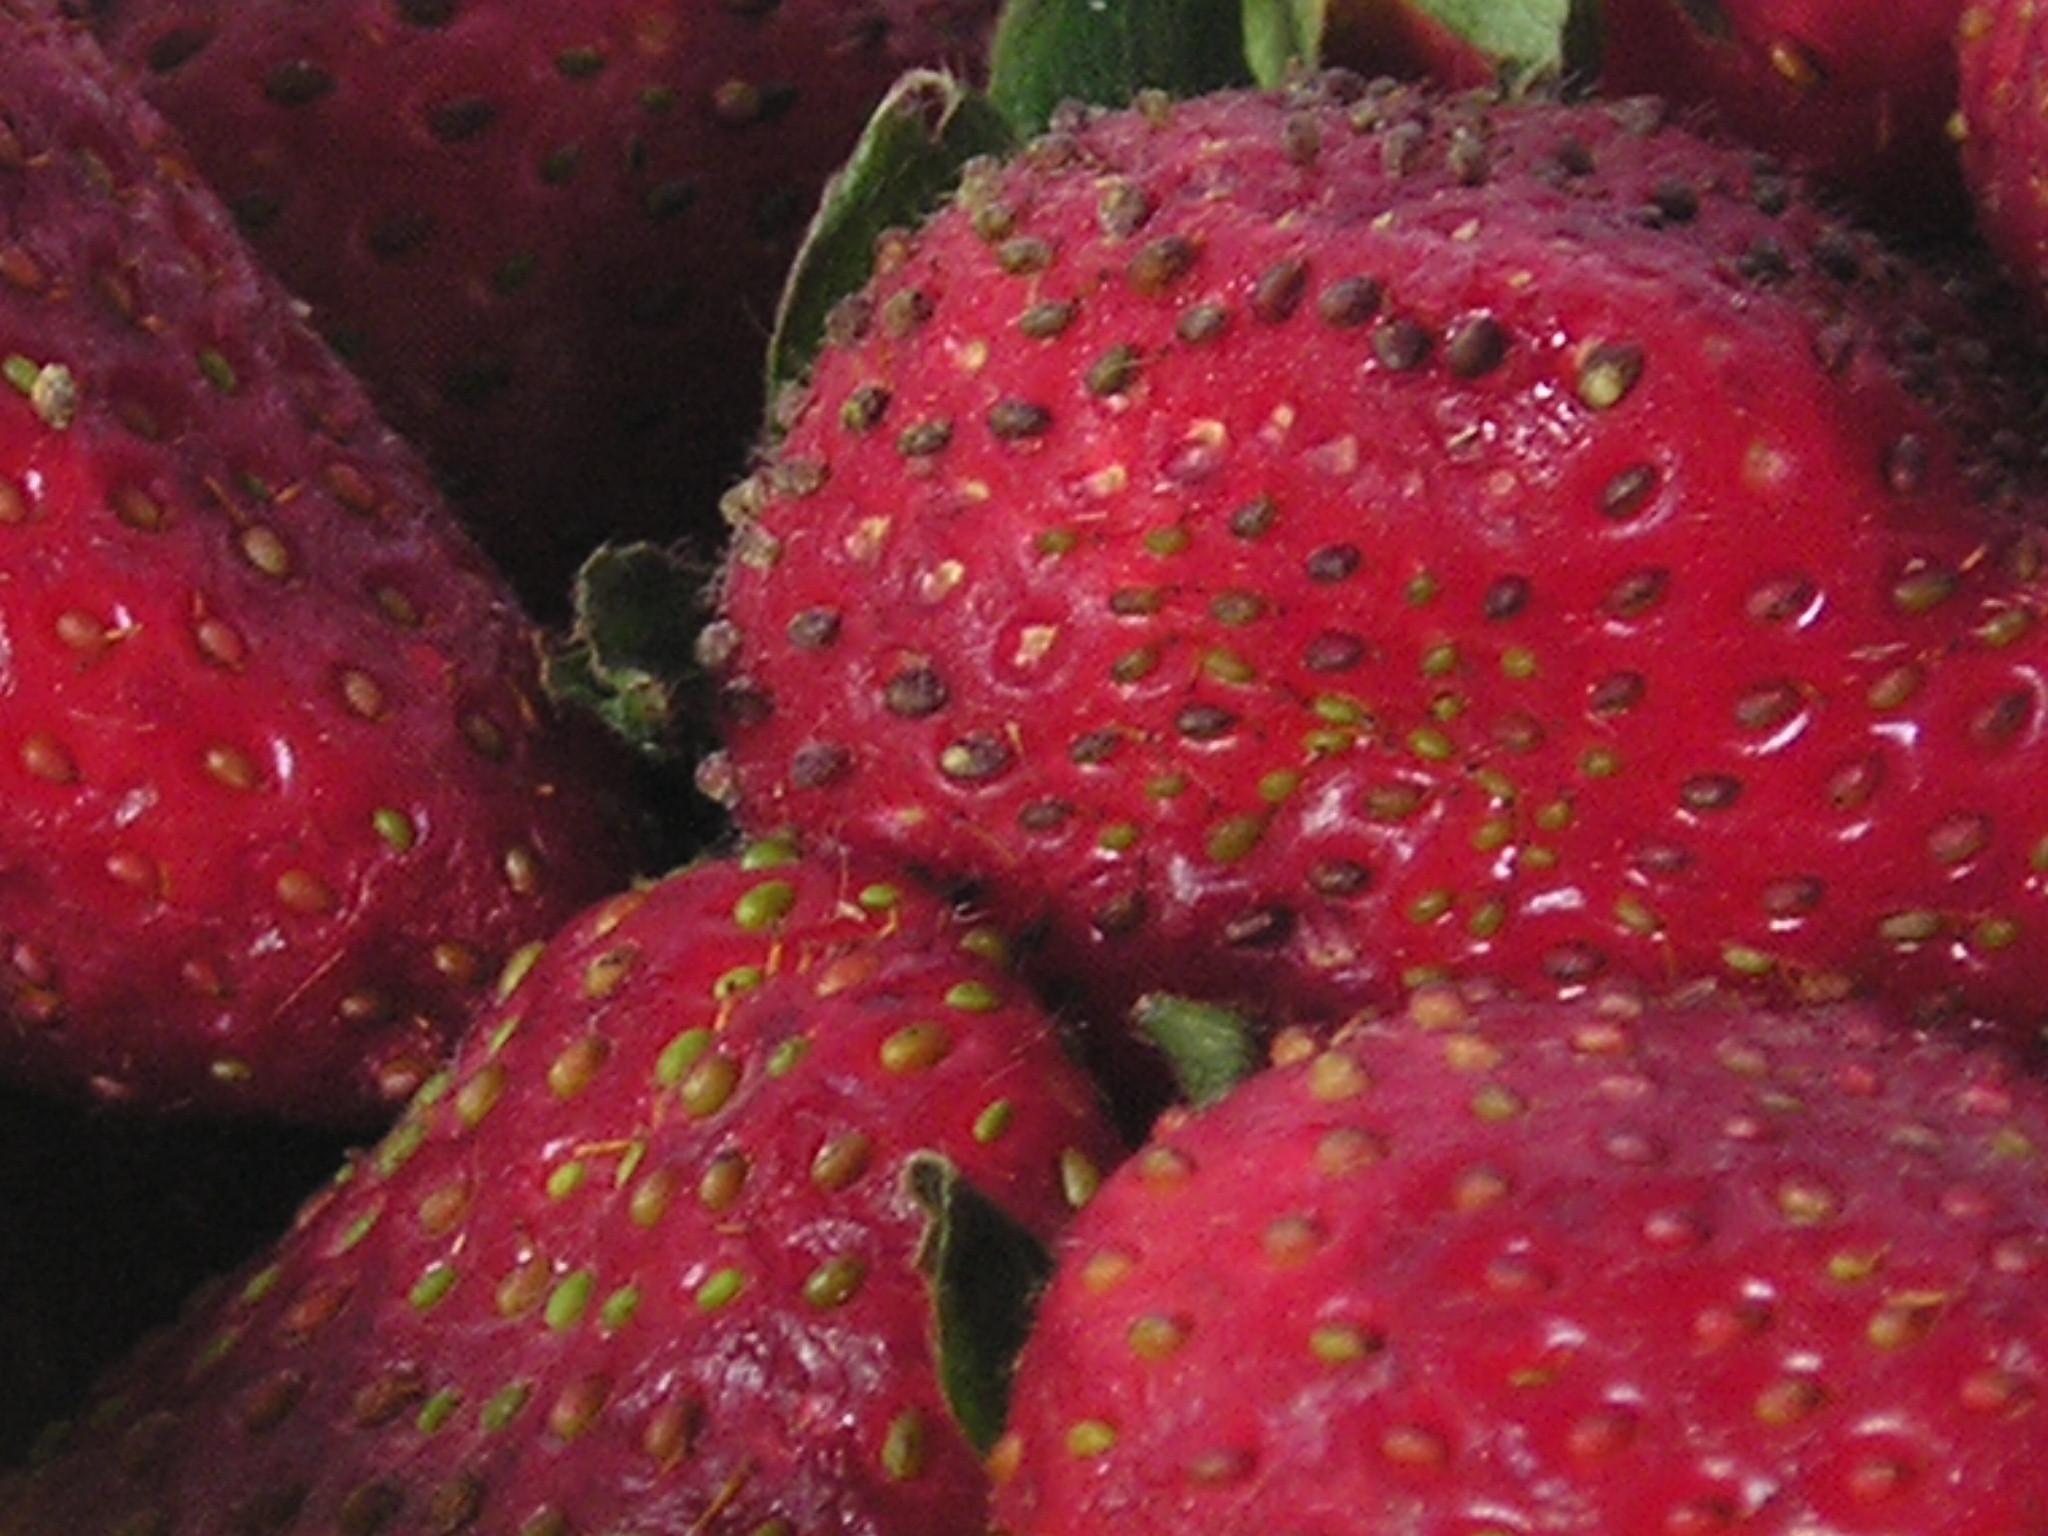 fruit strawberries 4 - photo #44